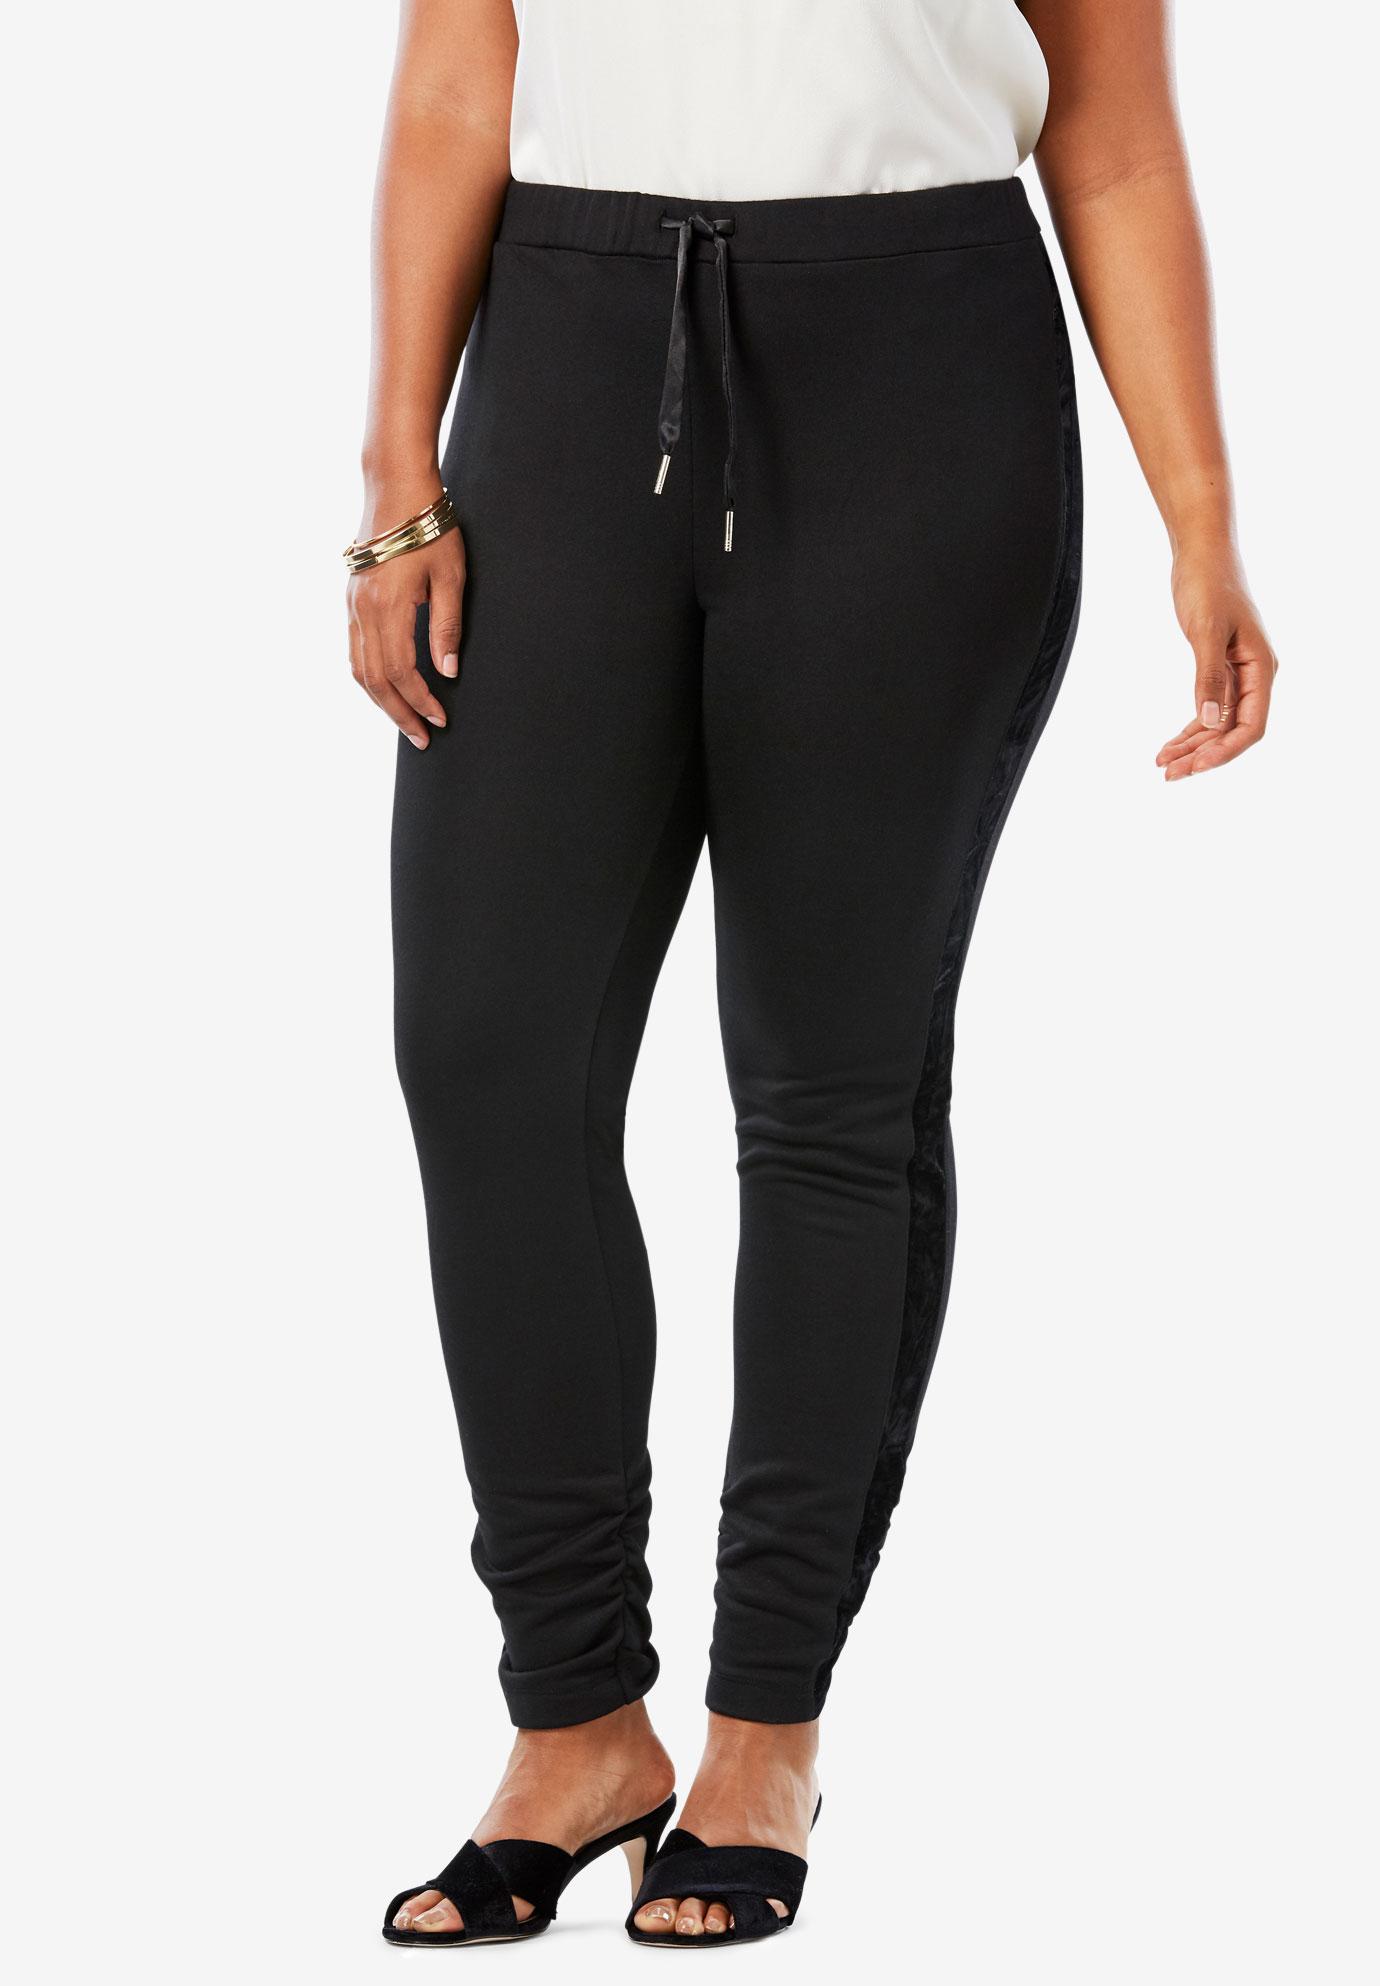 Velour Trim Legging Plus Size Pants